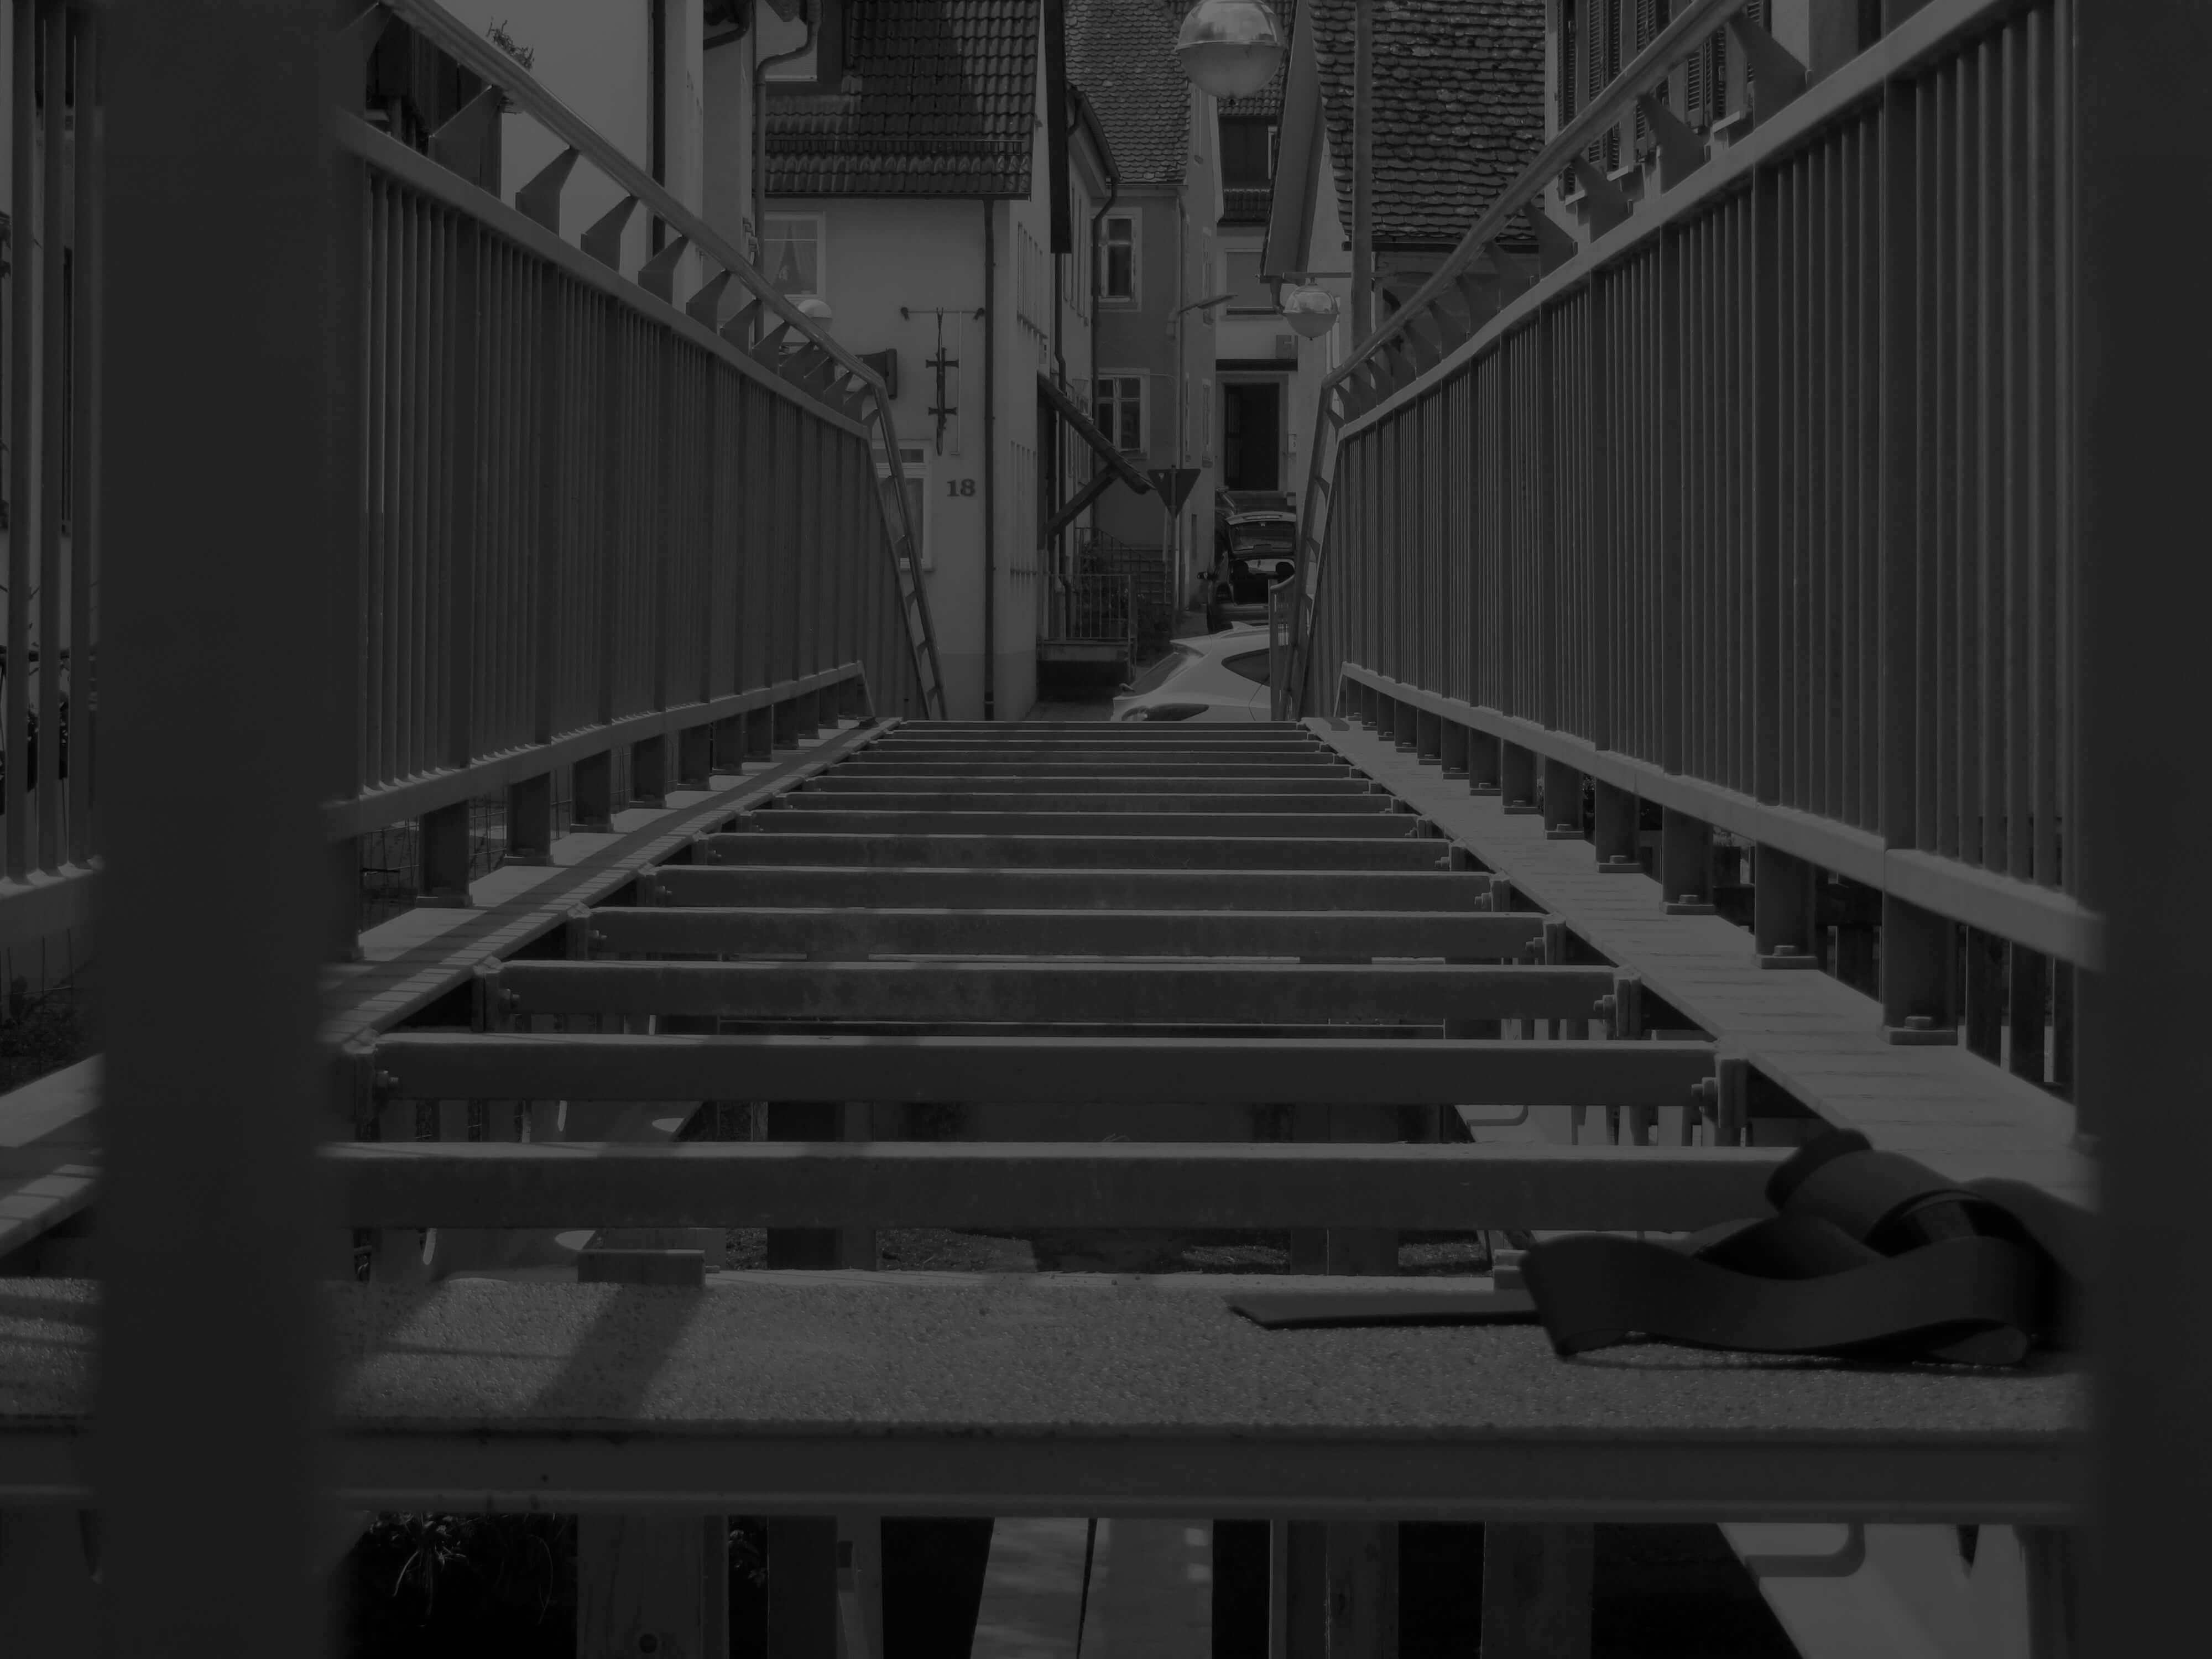 krafton-GRP-bridge-decking-planks